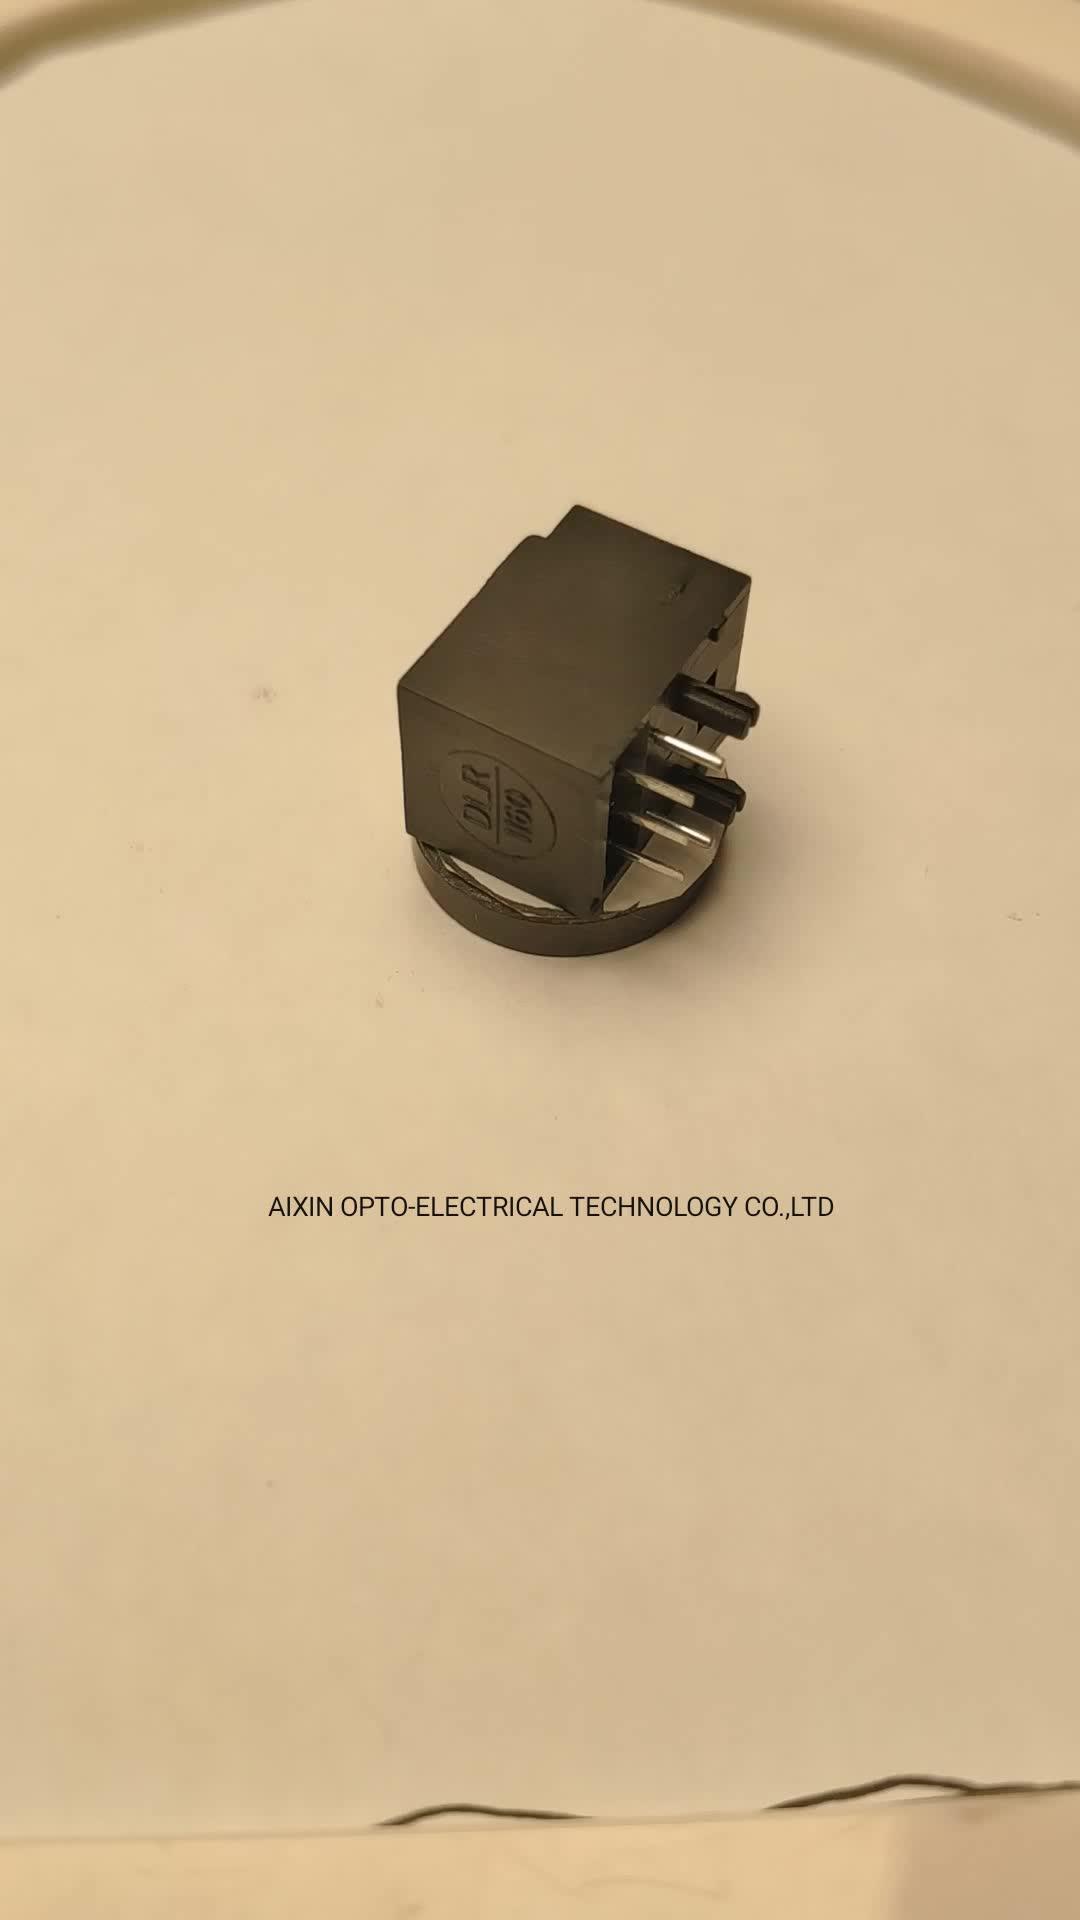 Quang toslink connector nhận sợi quang pcb jack DLR1160